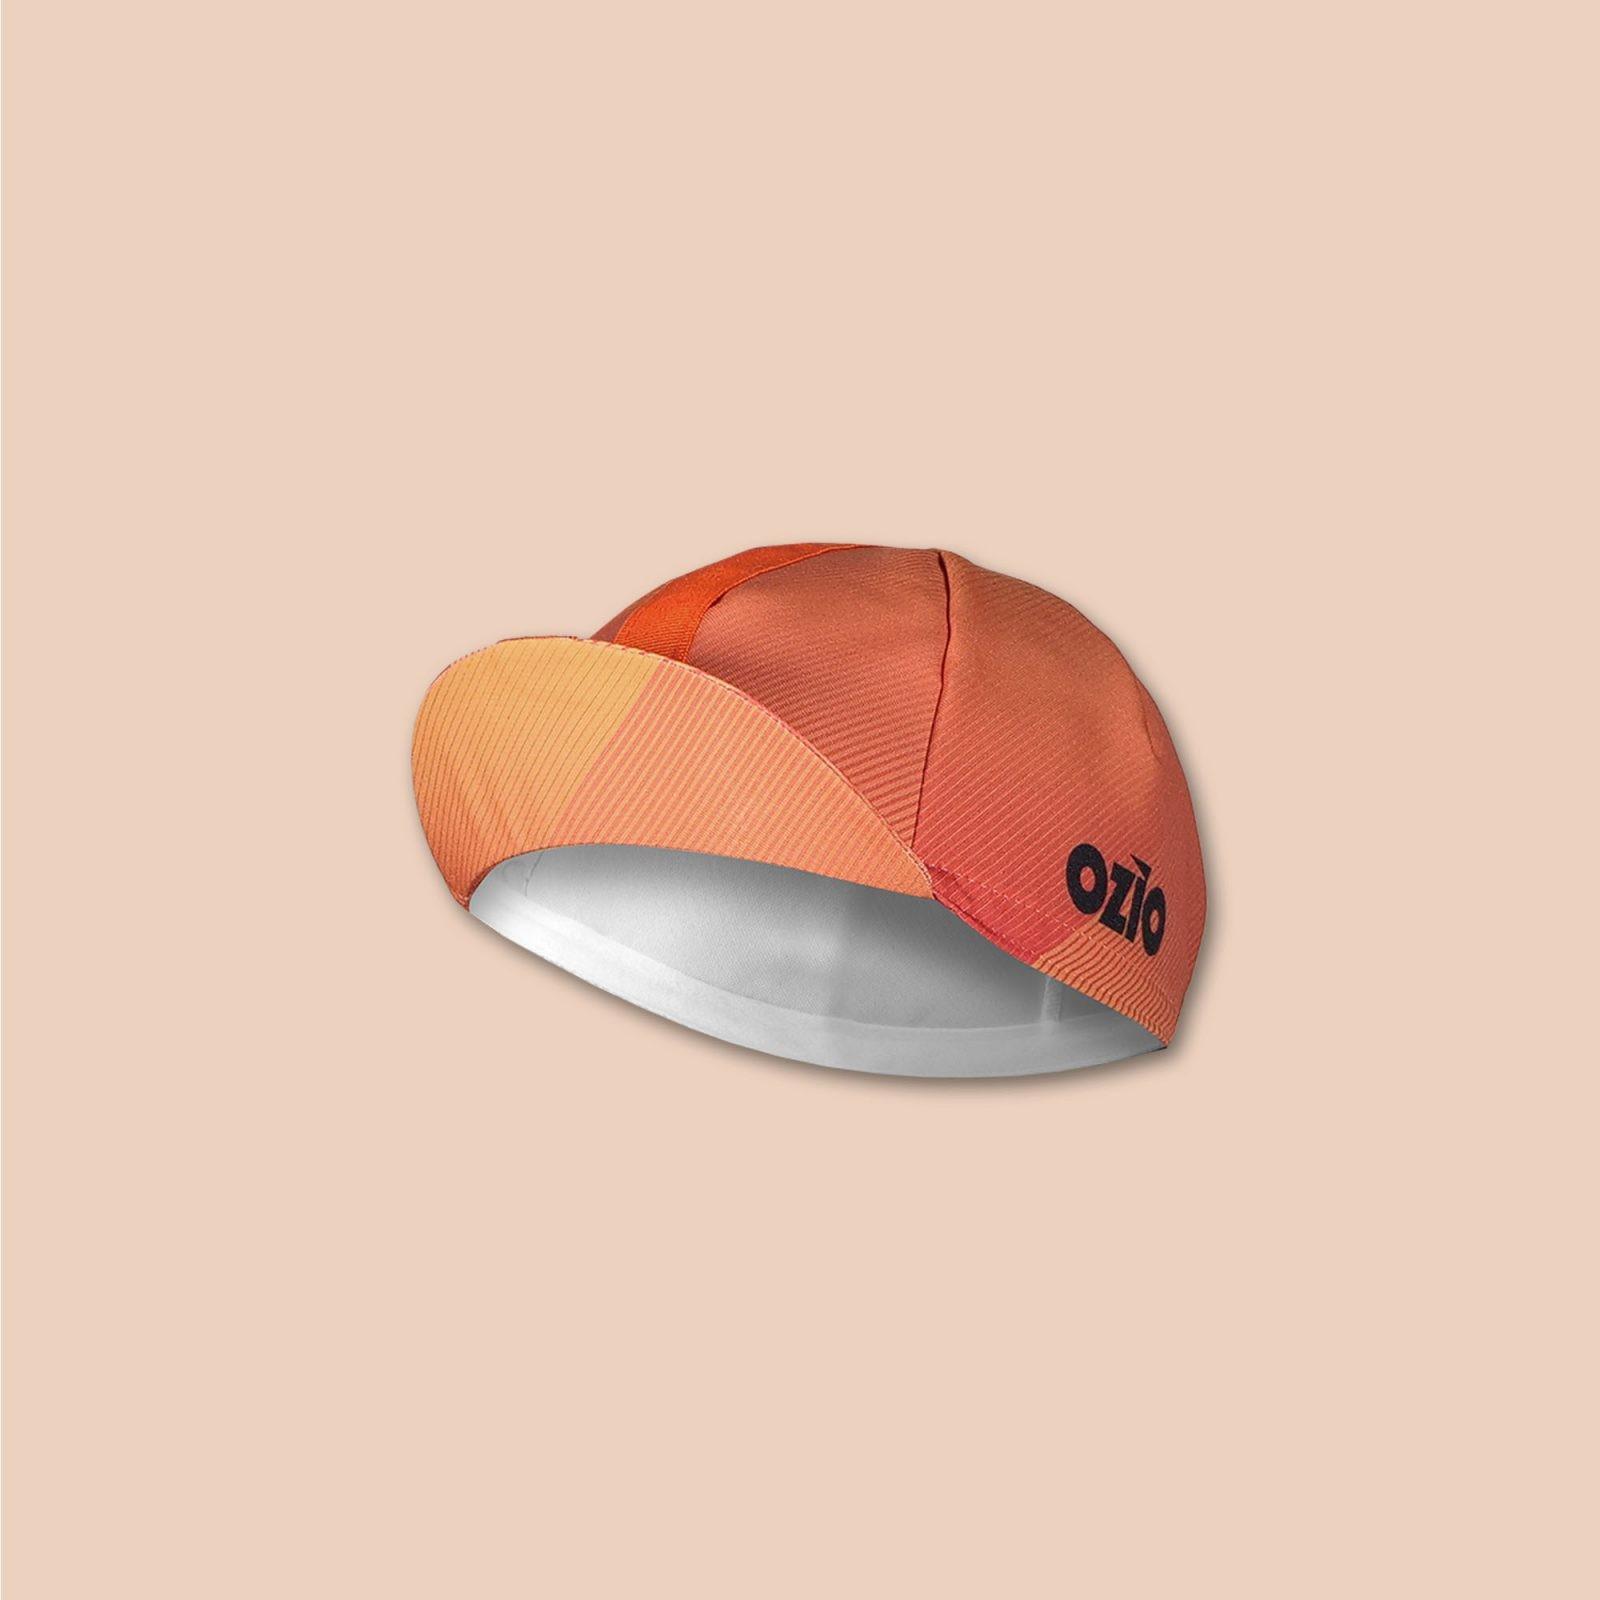 Casquette vélo orange vue 3/4